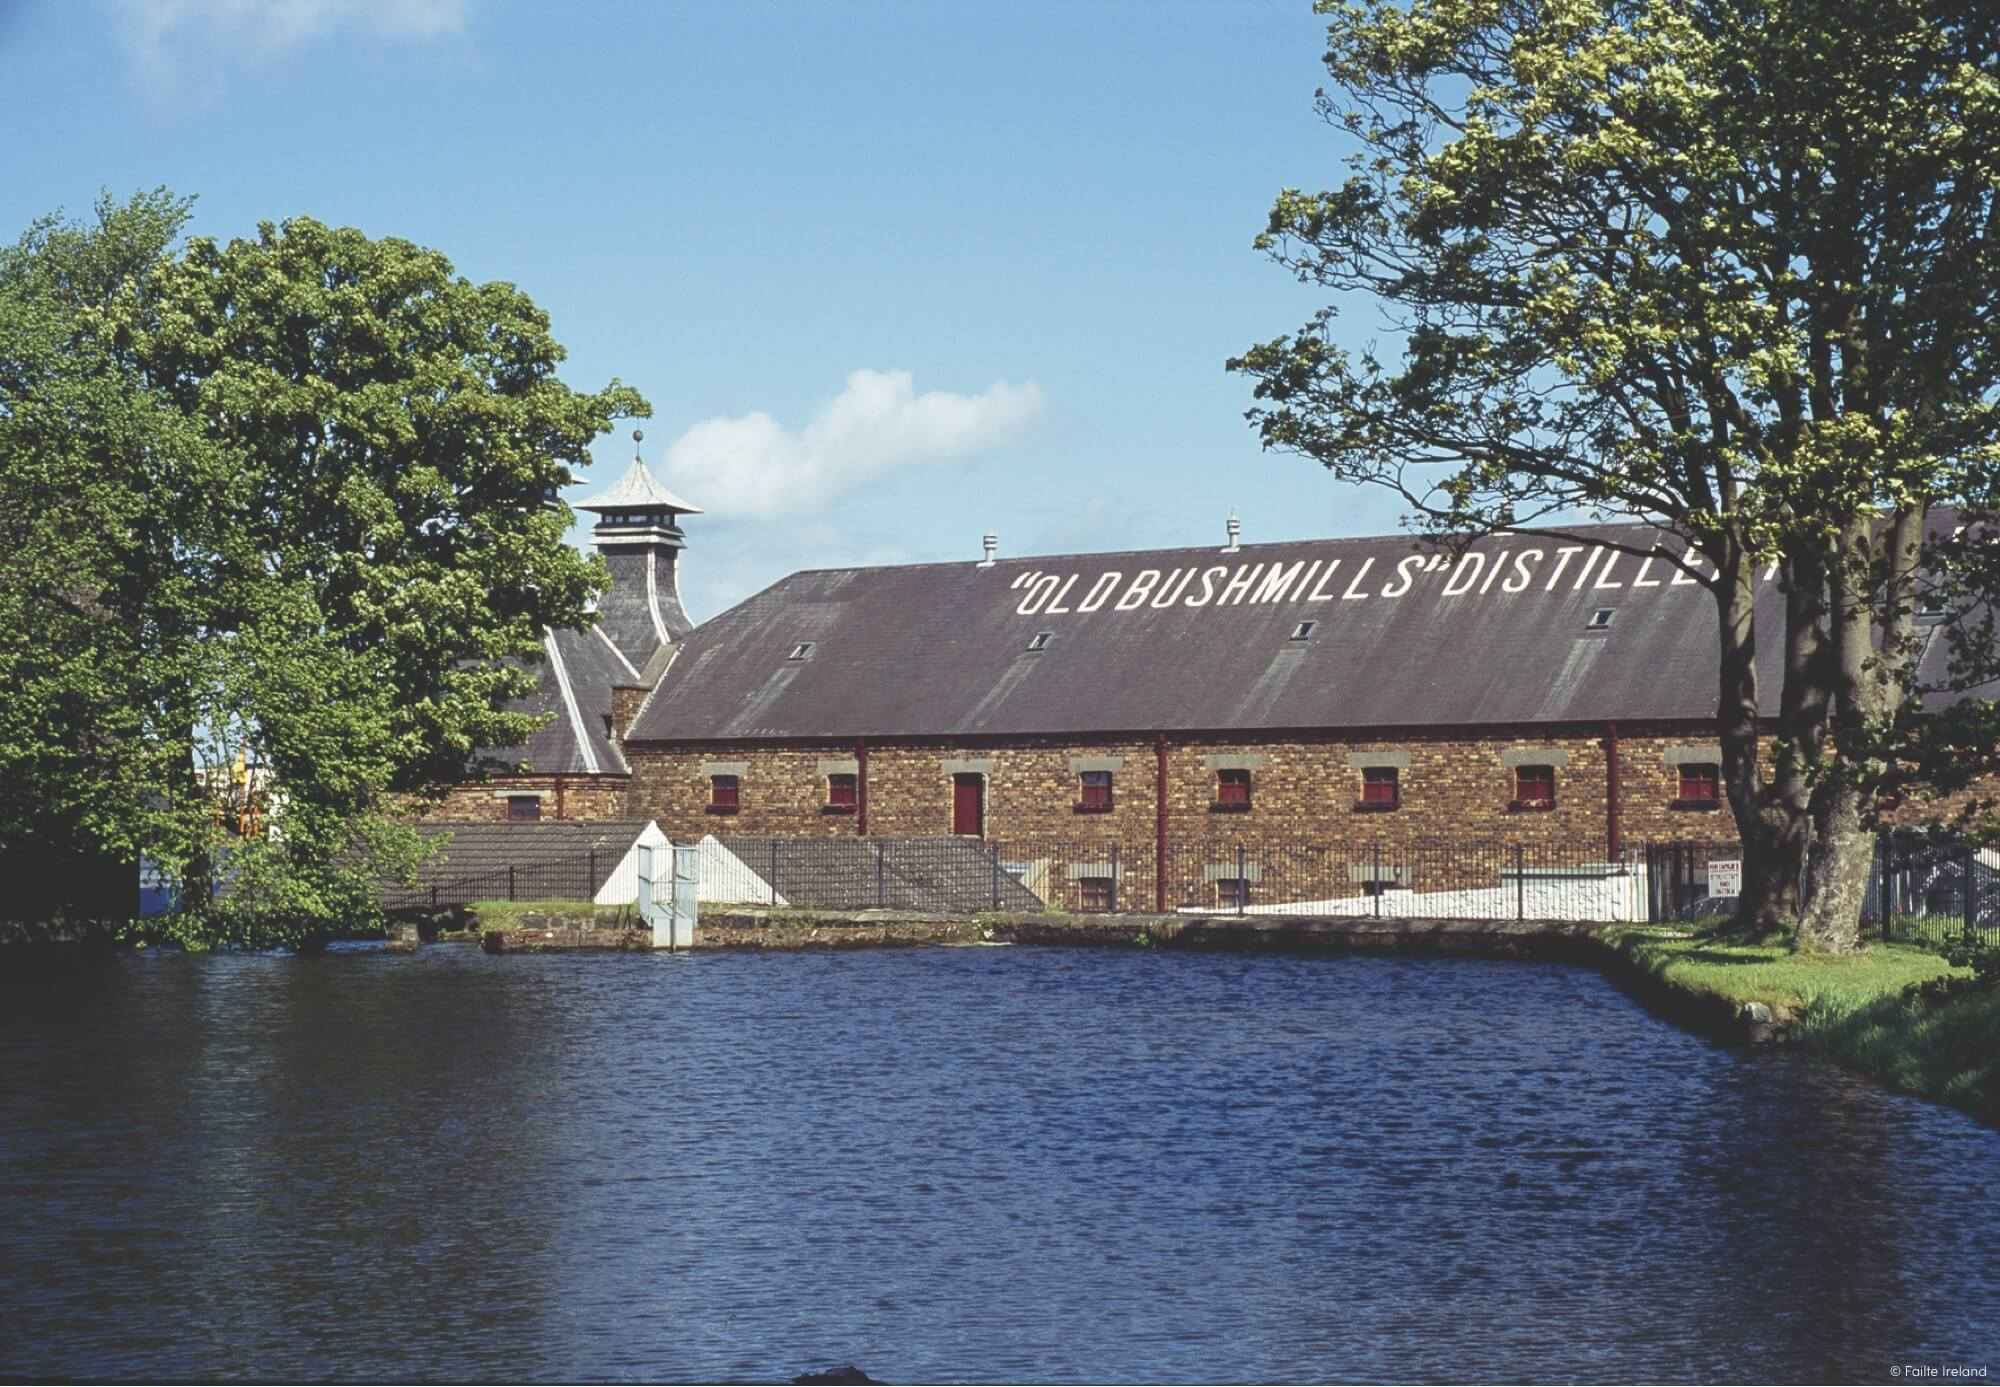 Old Bushmills Distillery'